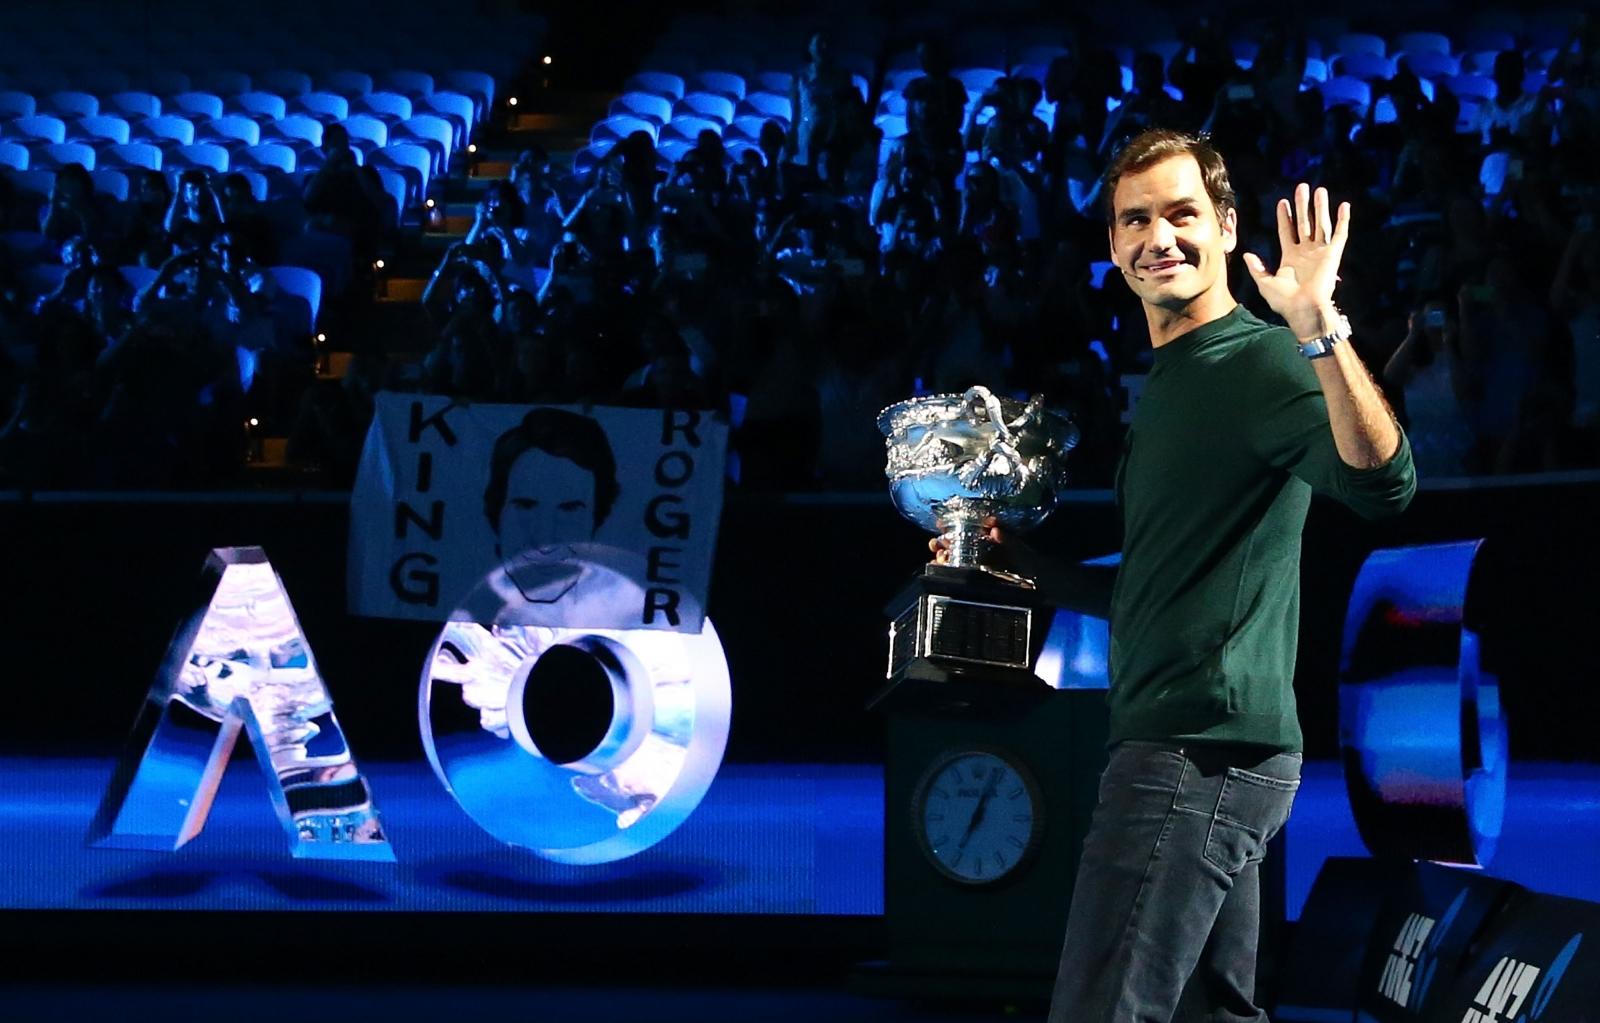 Djokovic dealt tough Australian Open draw as he plans tennis comeback